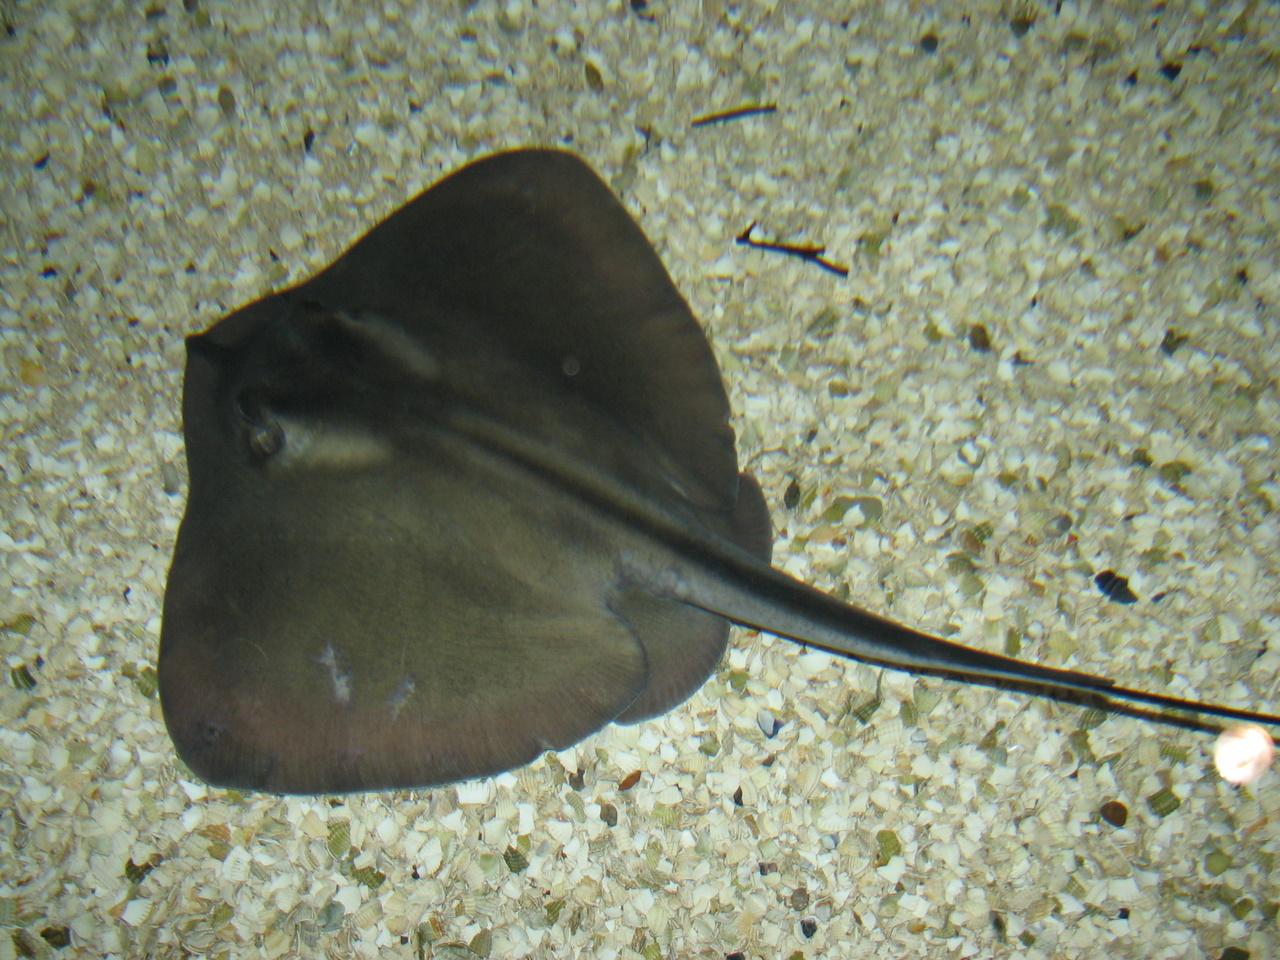 File:Common stingray tynemouth.jpg - Wikipedia